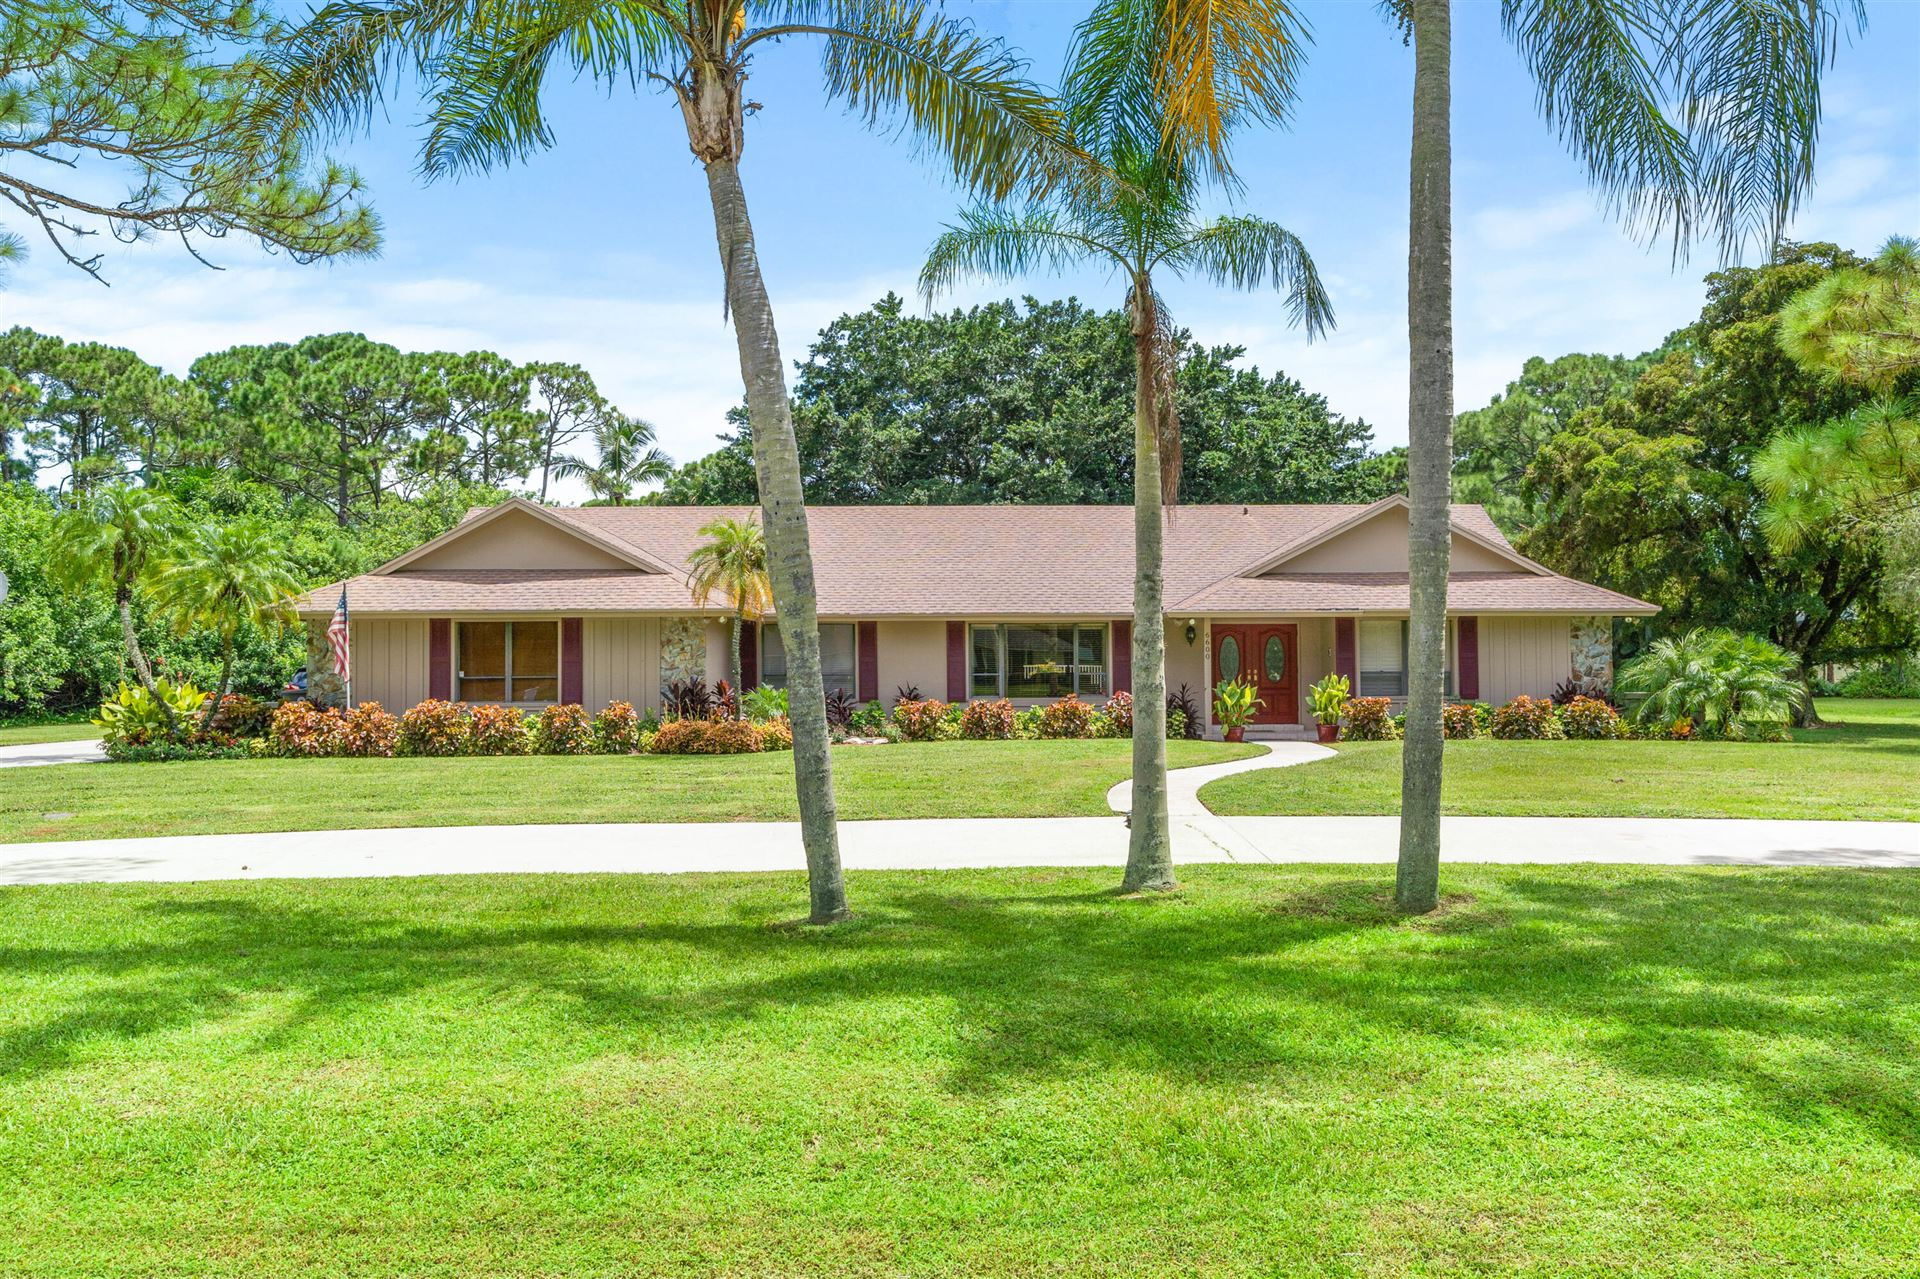 6600 141st Lane N, West Palm Beach, FL 33418 - #: RX-10735664